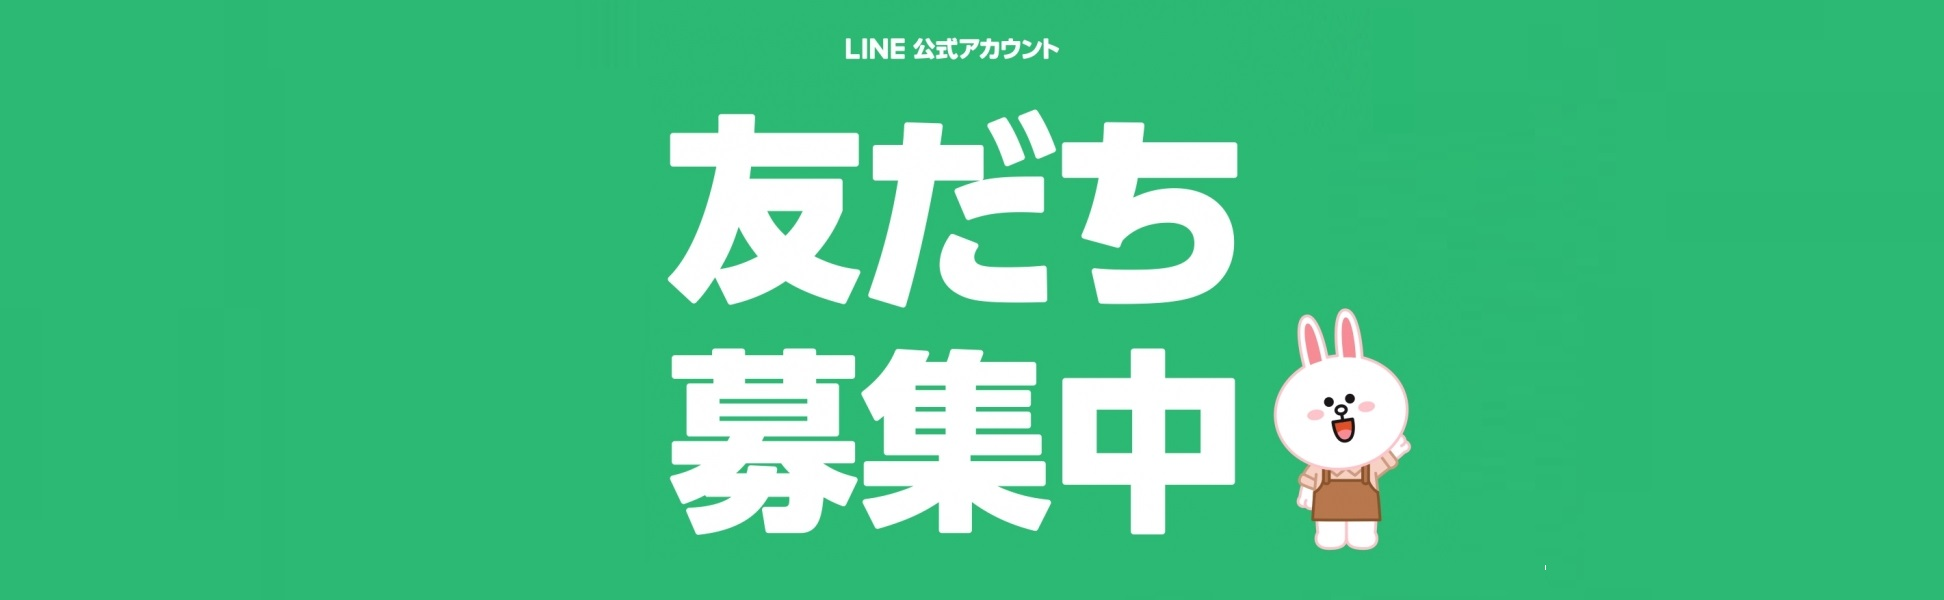 FREAK LINE